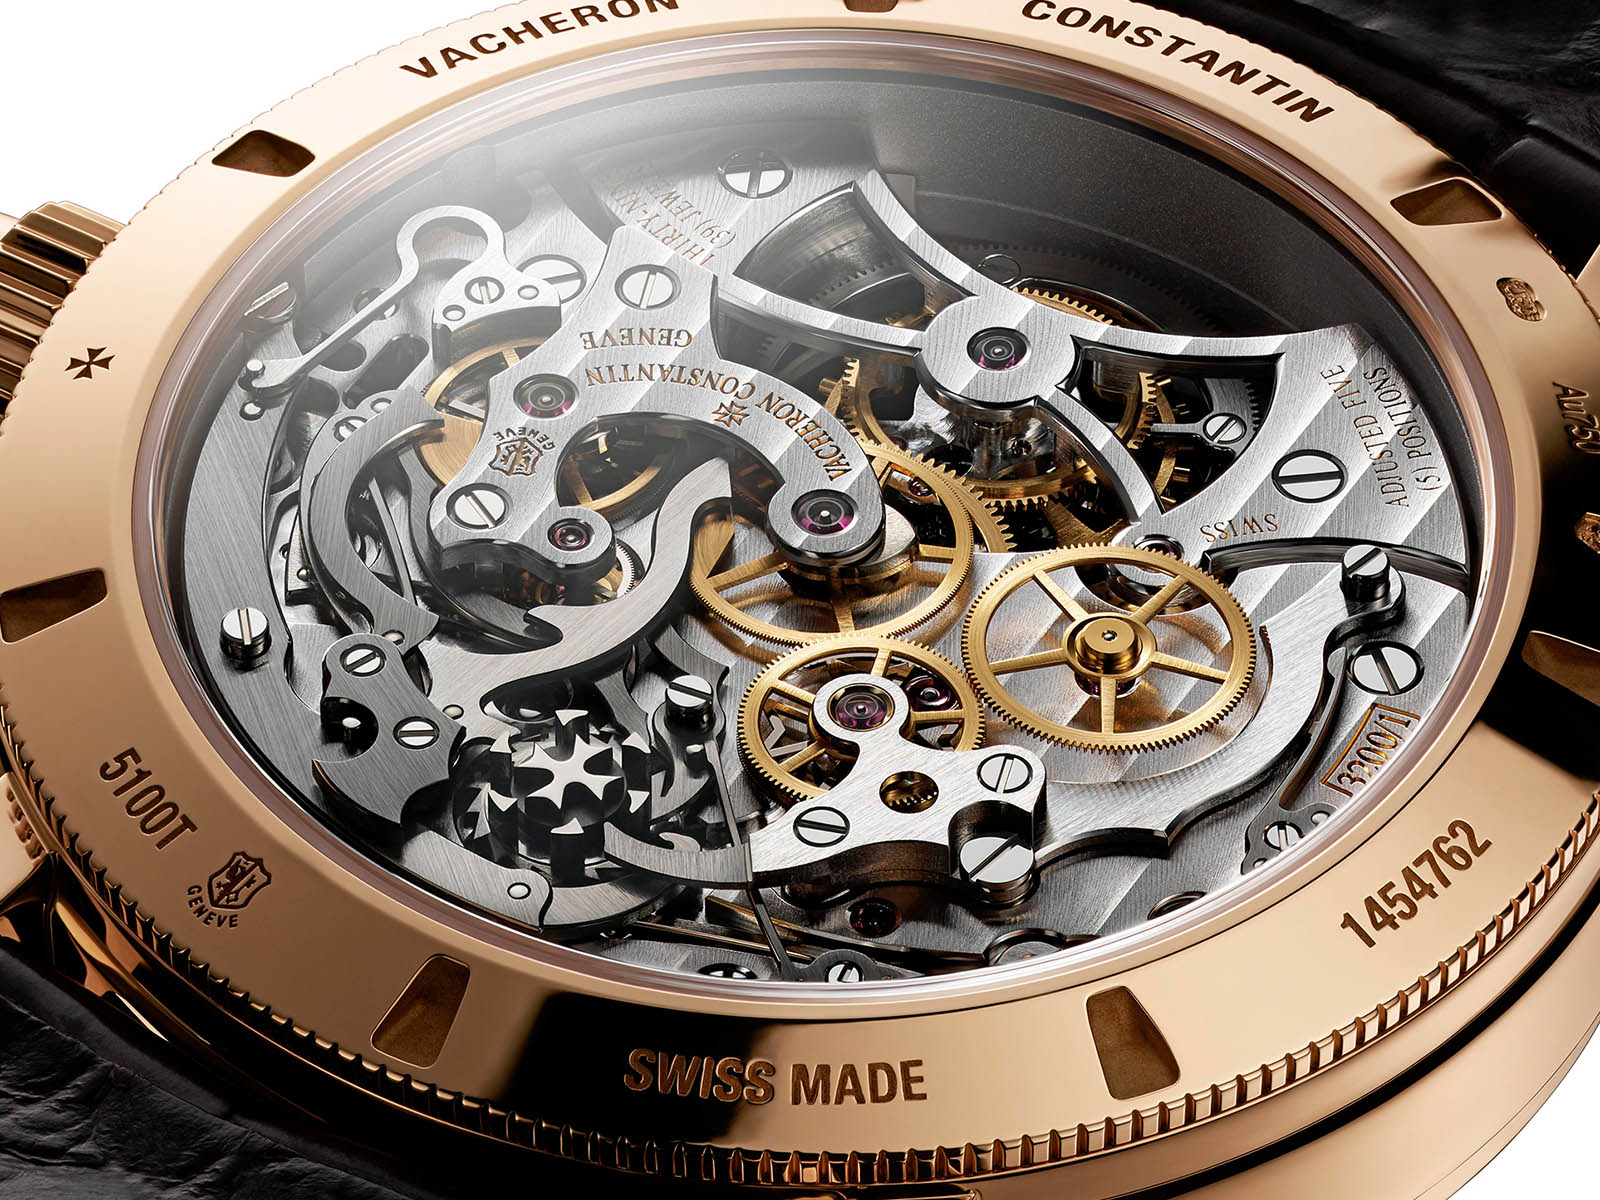 5100t-000r-b623-vacheron-constantin-traditionnelle-tourbillon-chronograph-5.jpg